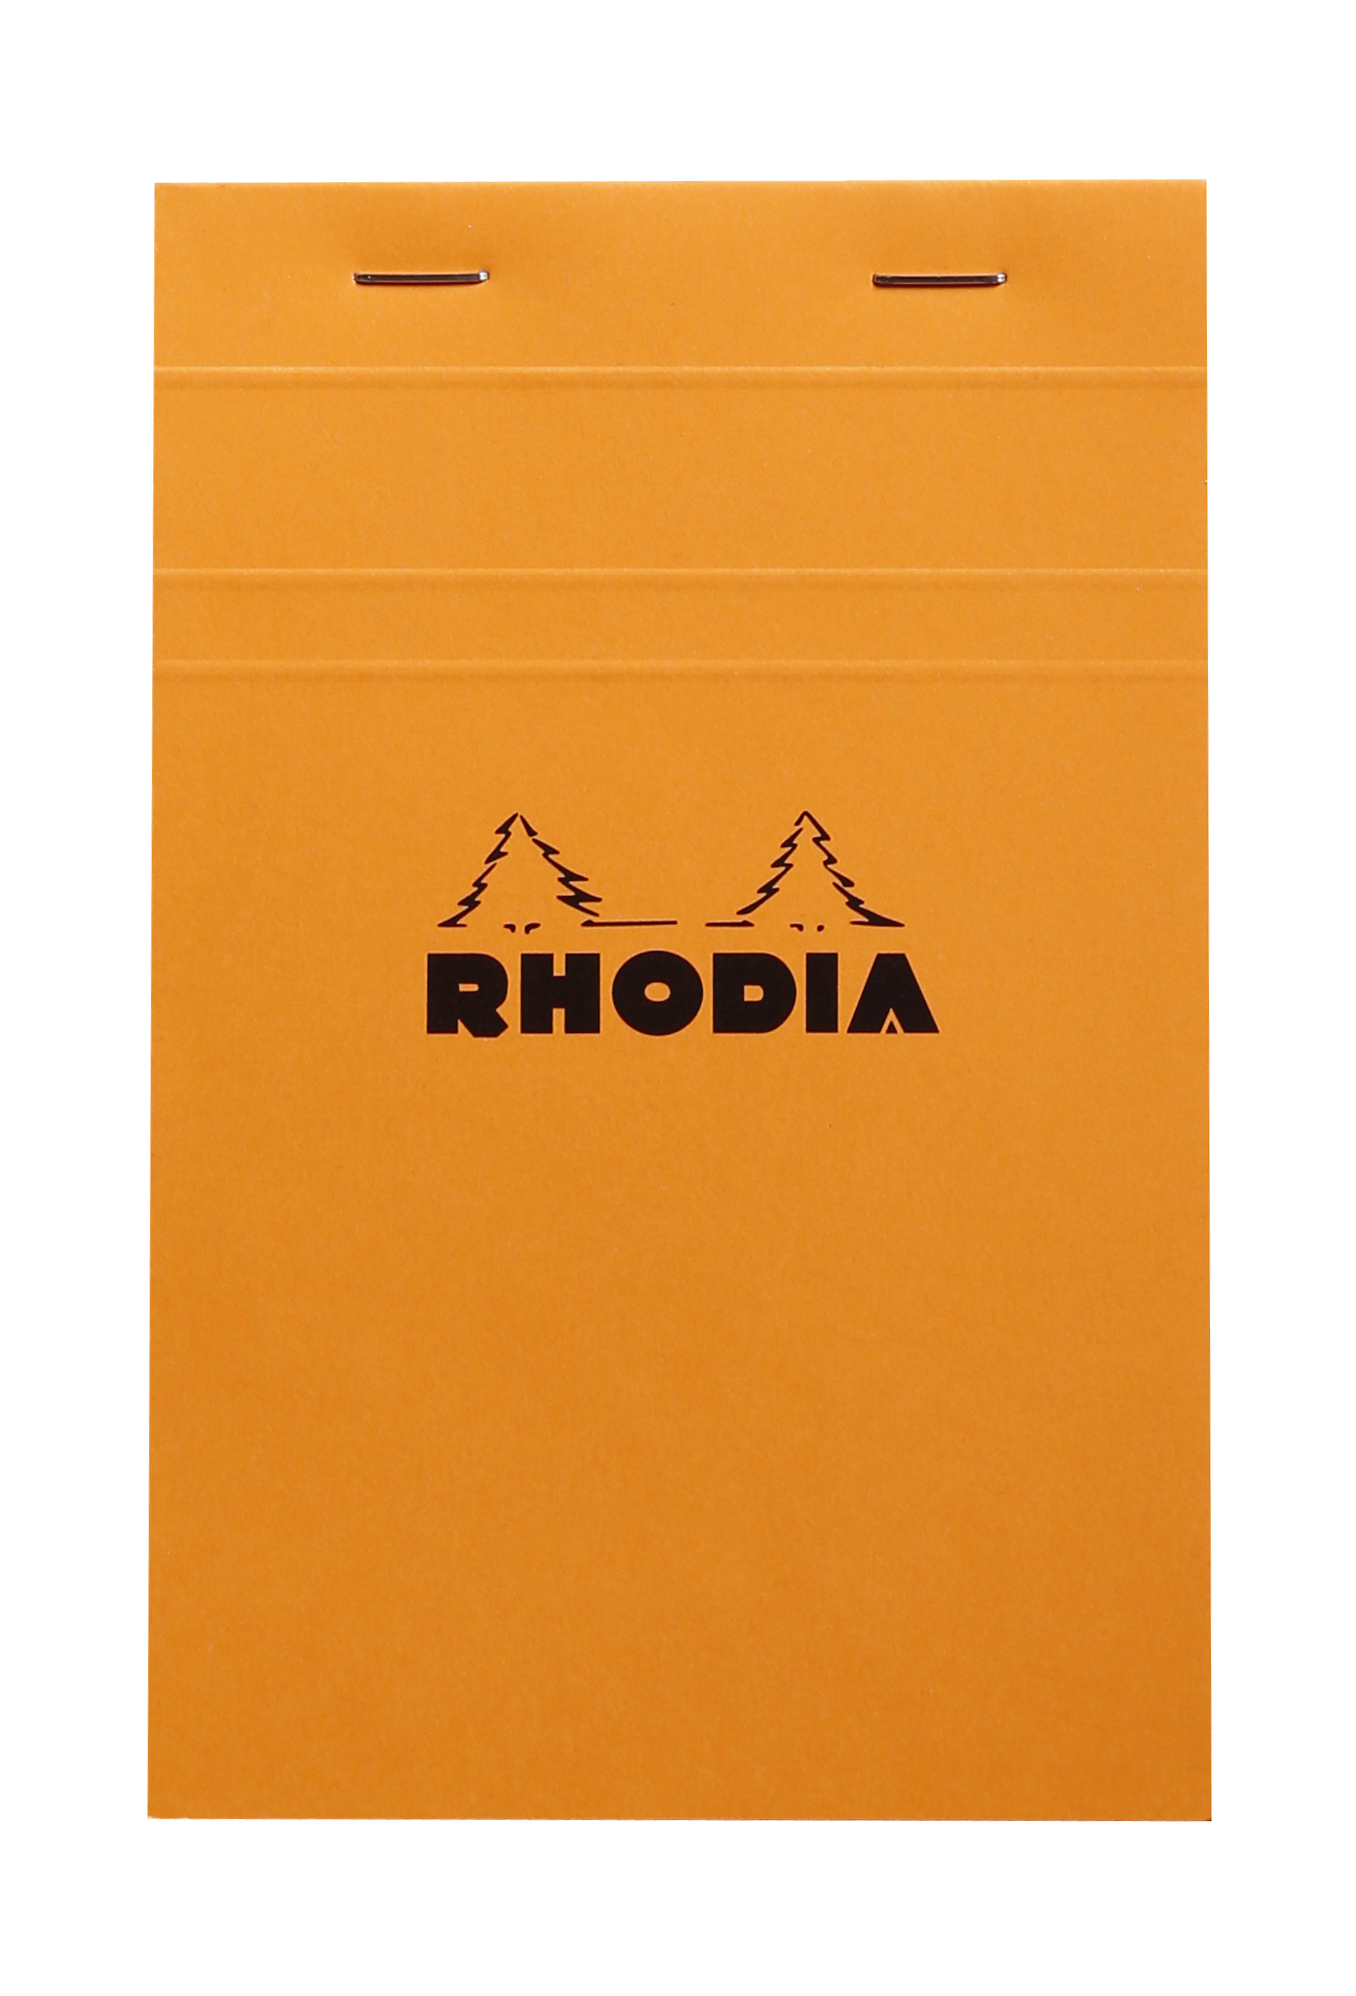 Rhodia - Bloc notes - 11 x 17 cm - petits carreaux - 80g